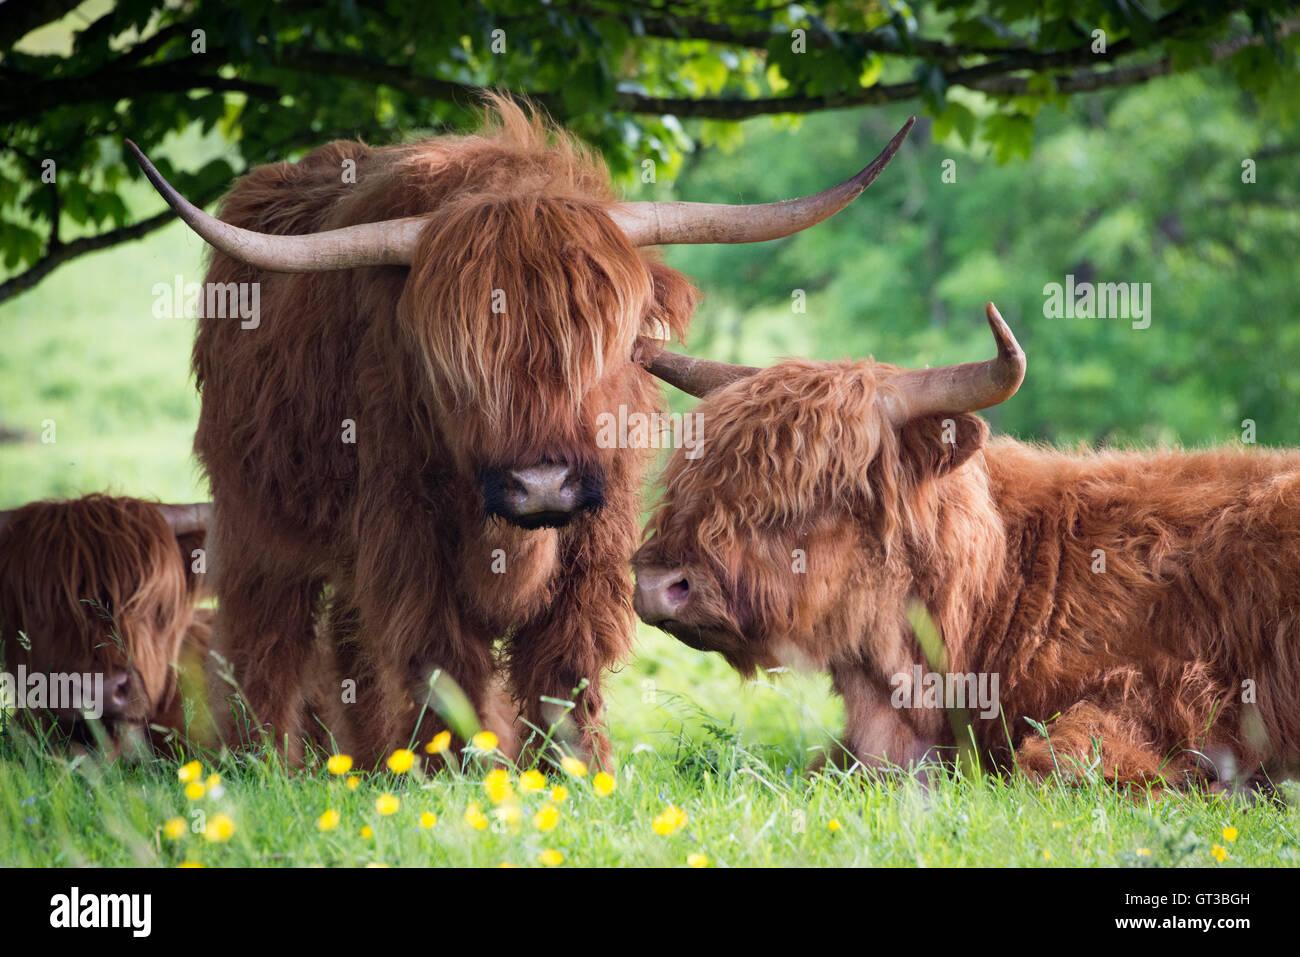 Highland cattle grazing at Arnside Knott, Lancashire/Cumbria border - Stock Image